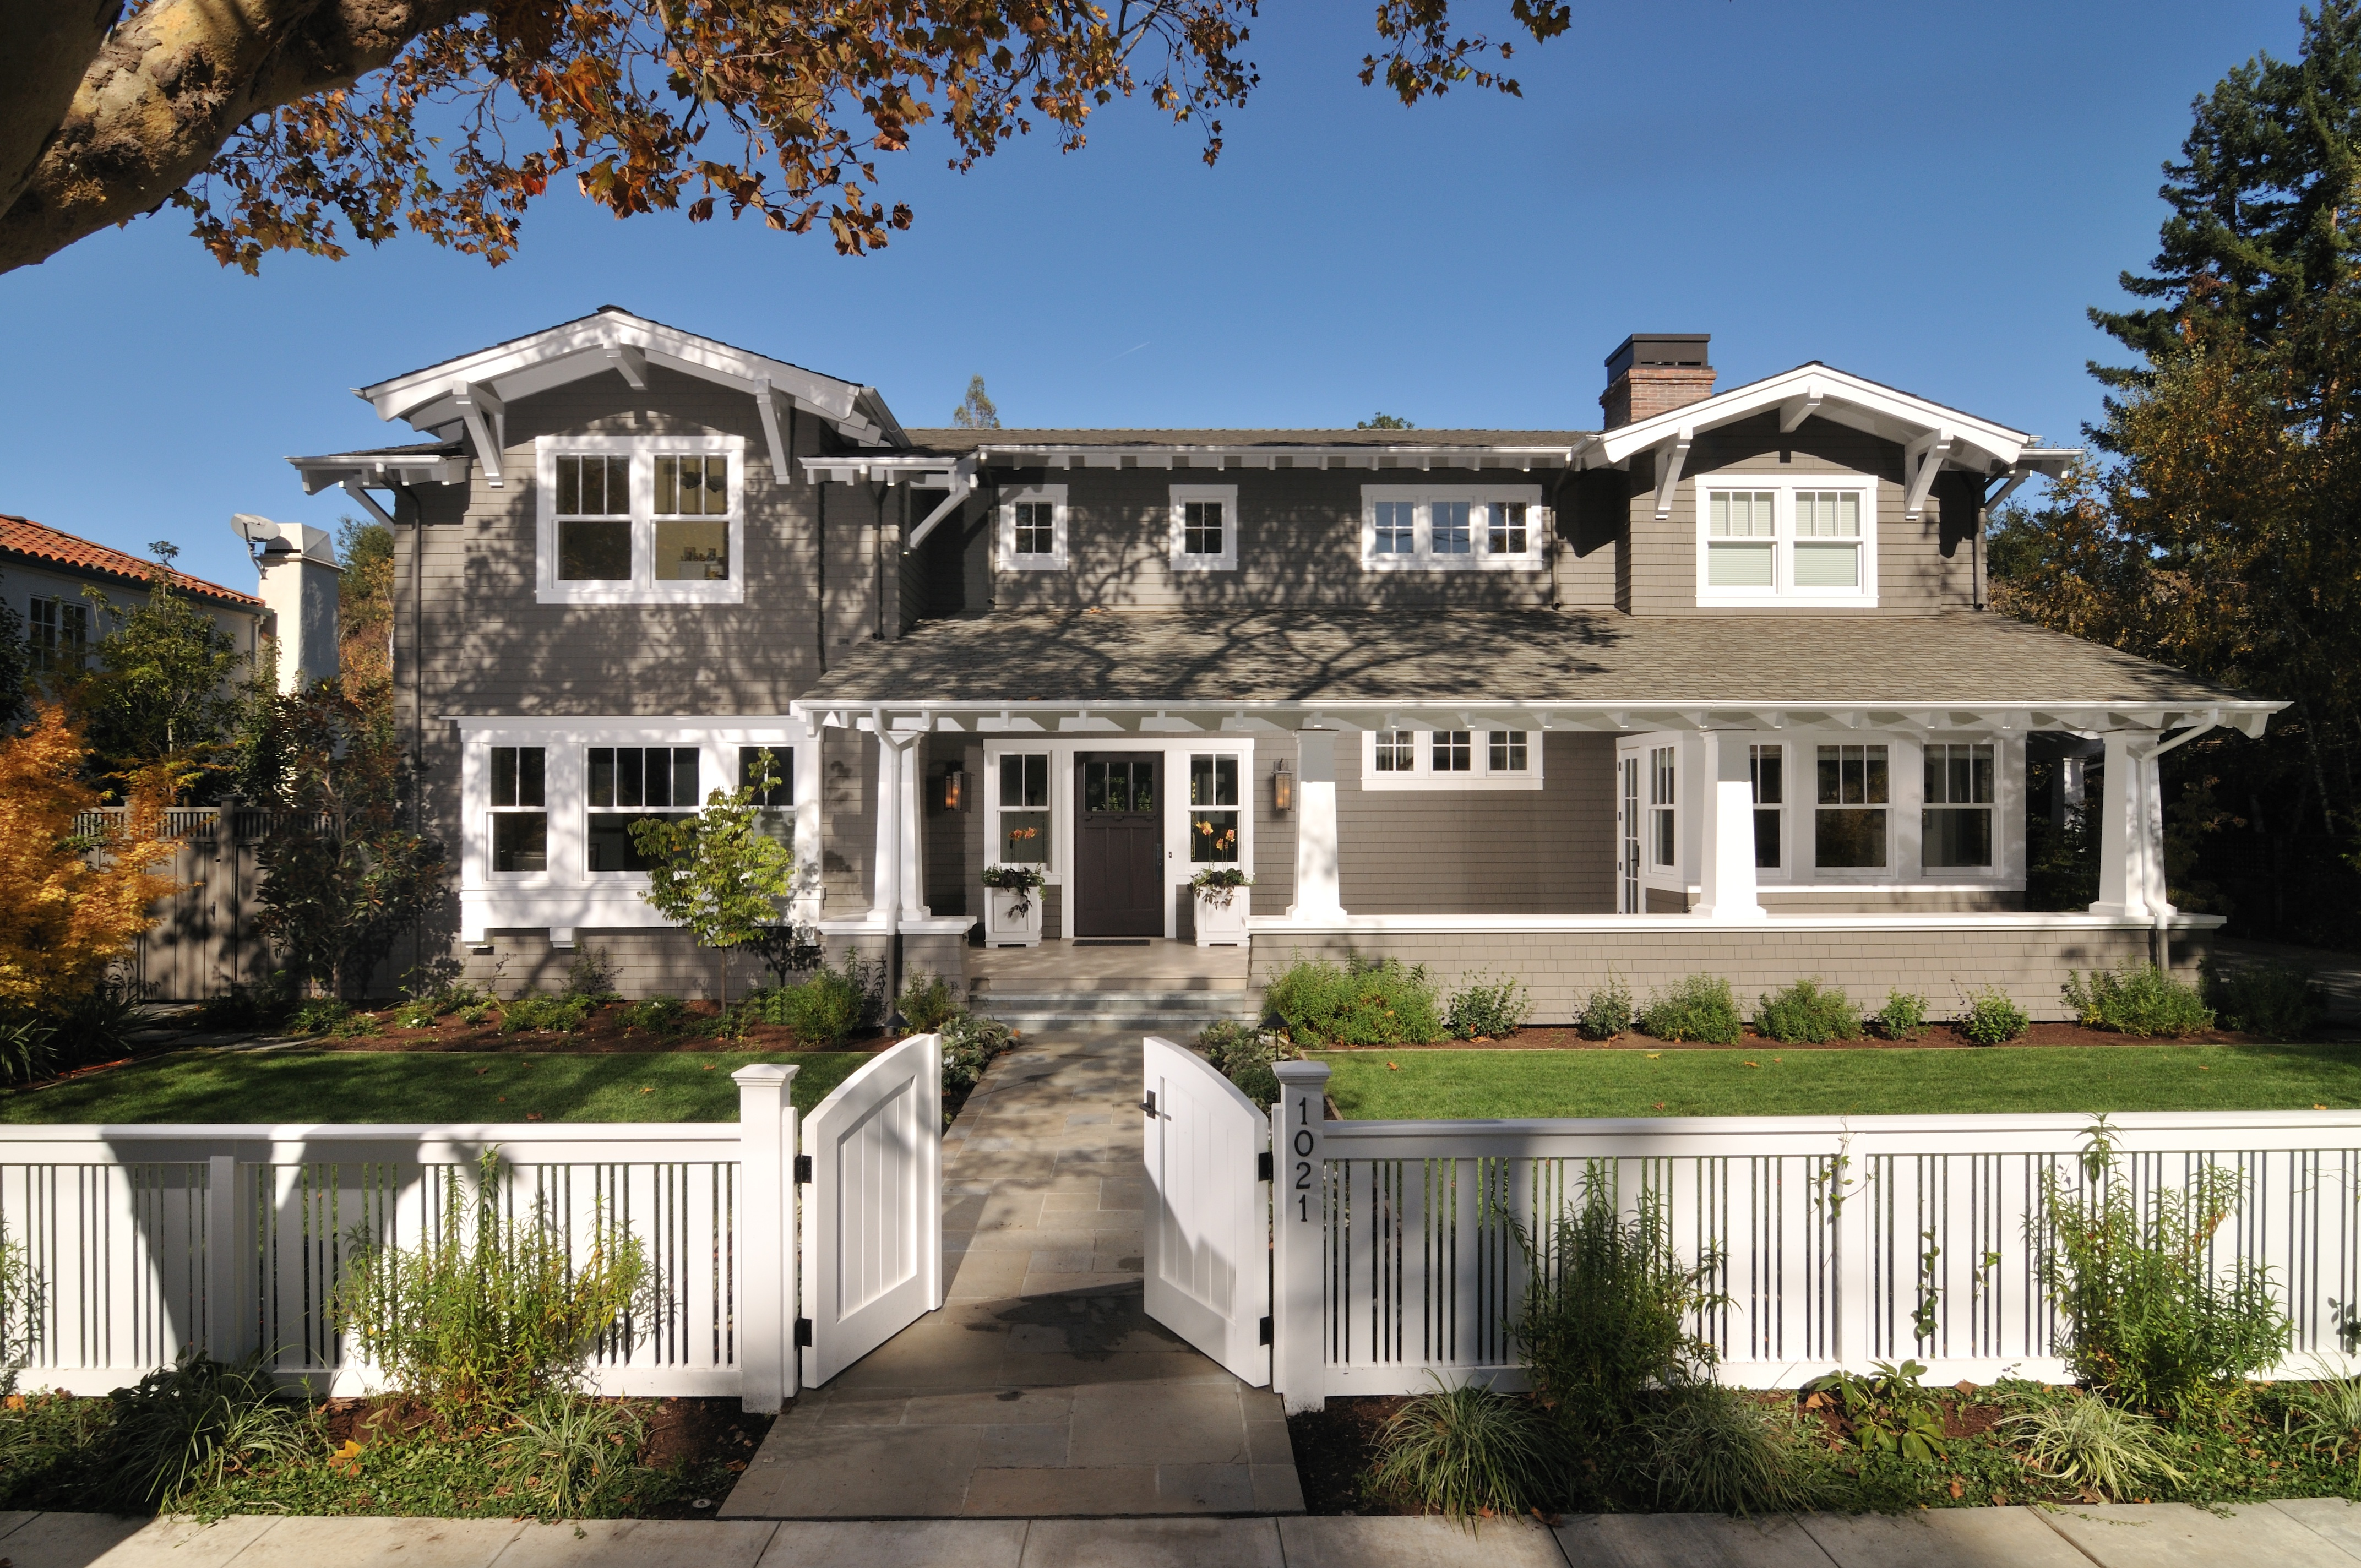 Amazing California Craftsman Homes #8: Marvin Architectu0027s Challenge: California Craftsman, Palo Alto Family Home U2013  BAKE Real Estate